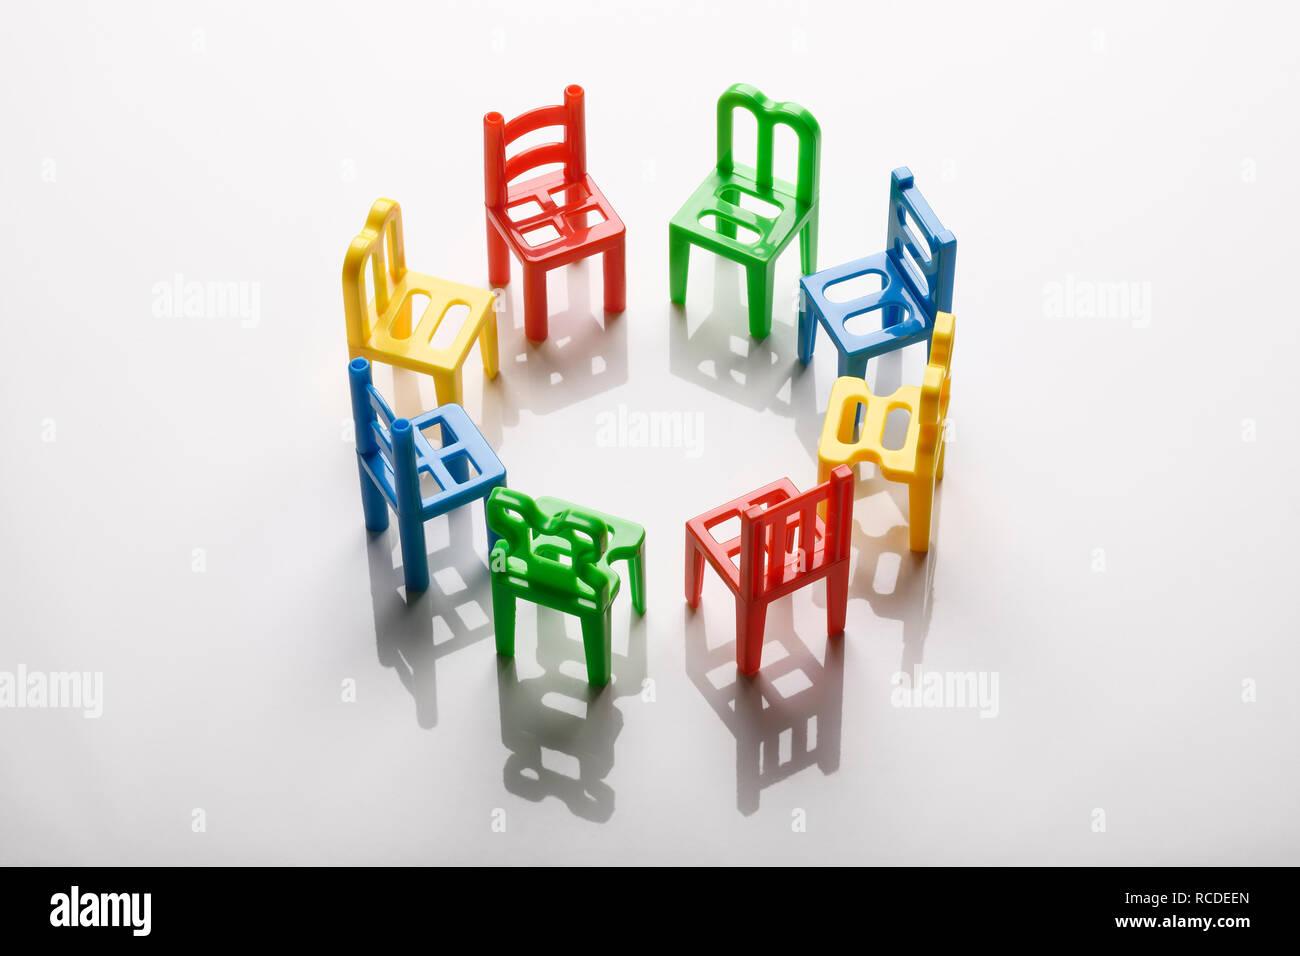 A circle of mini plastic chairs  sc 1 st  Alamy & A circle of mini plastic chairs Stock Photo: 231407421 - Alamy